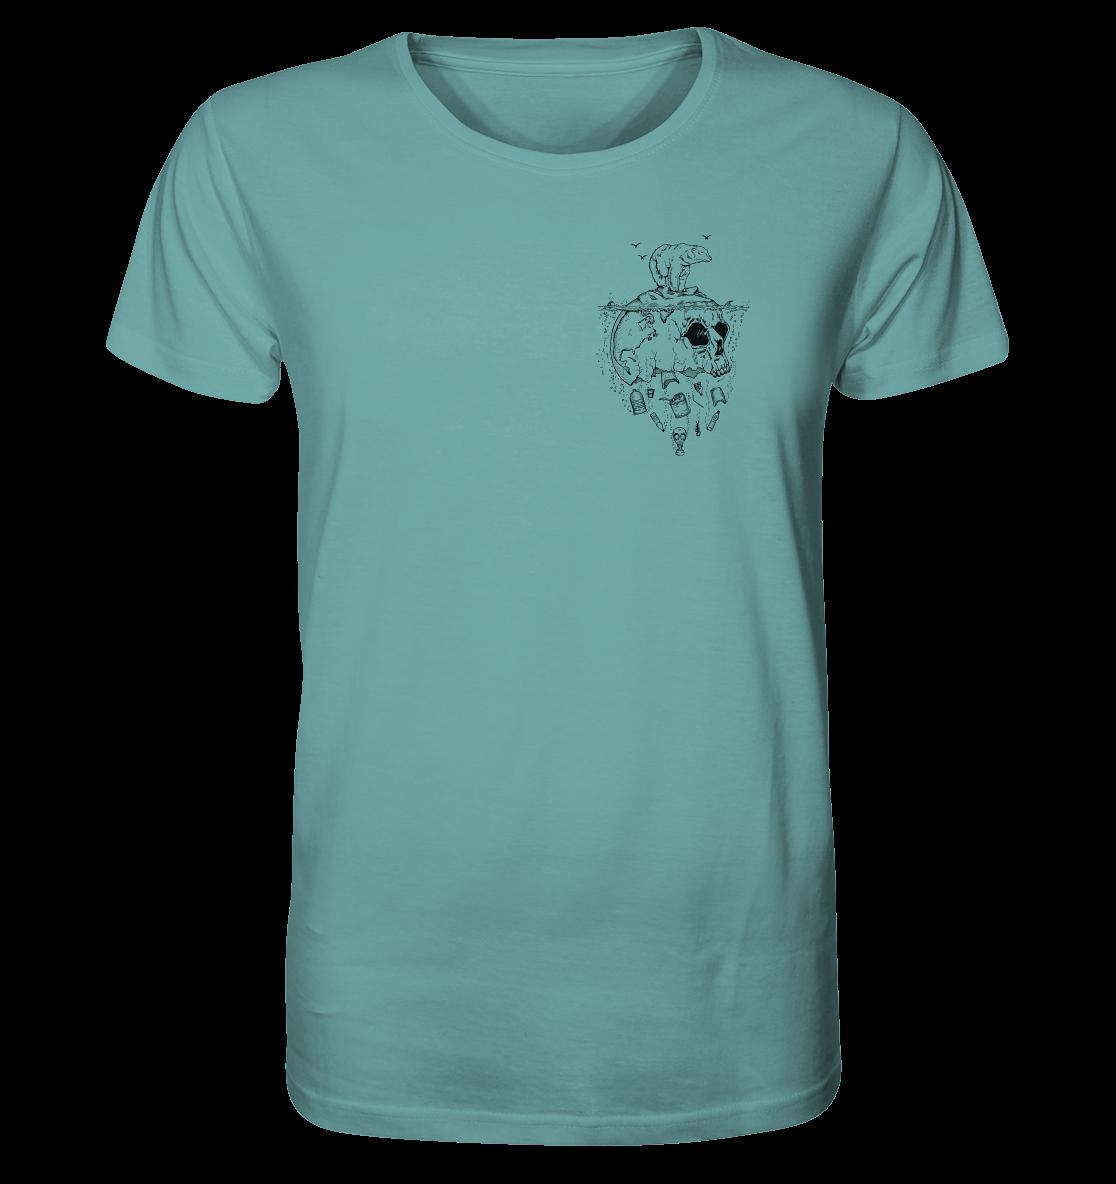 front-organic-shirt-70a7a7-1116x-20.png